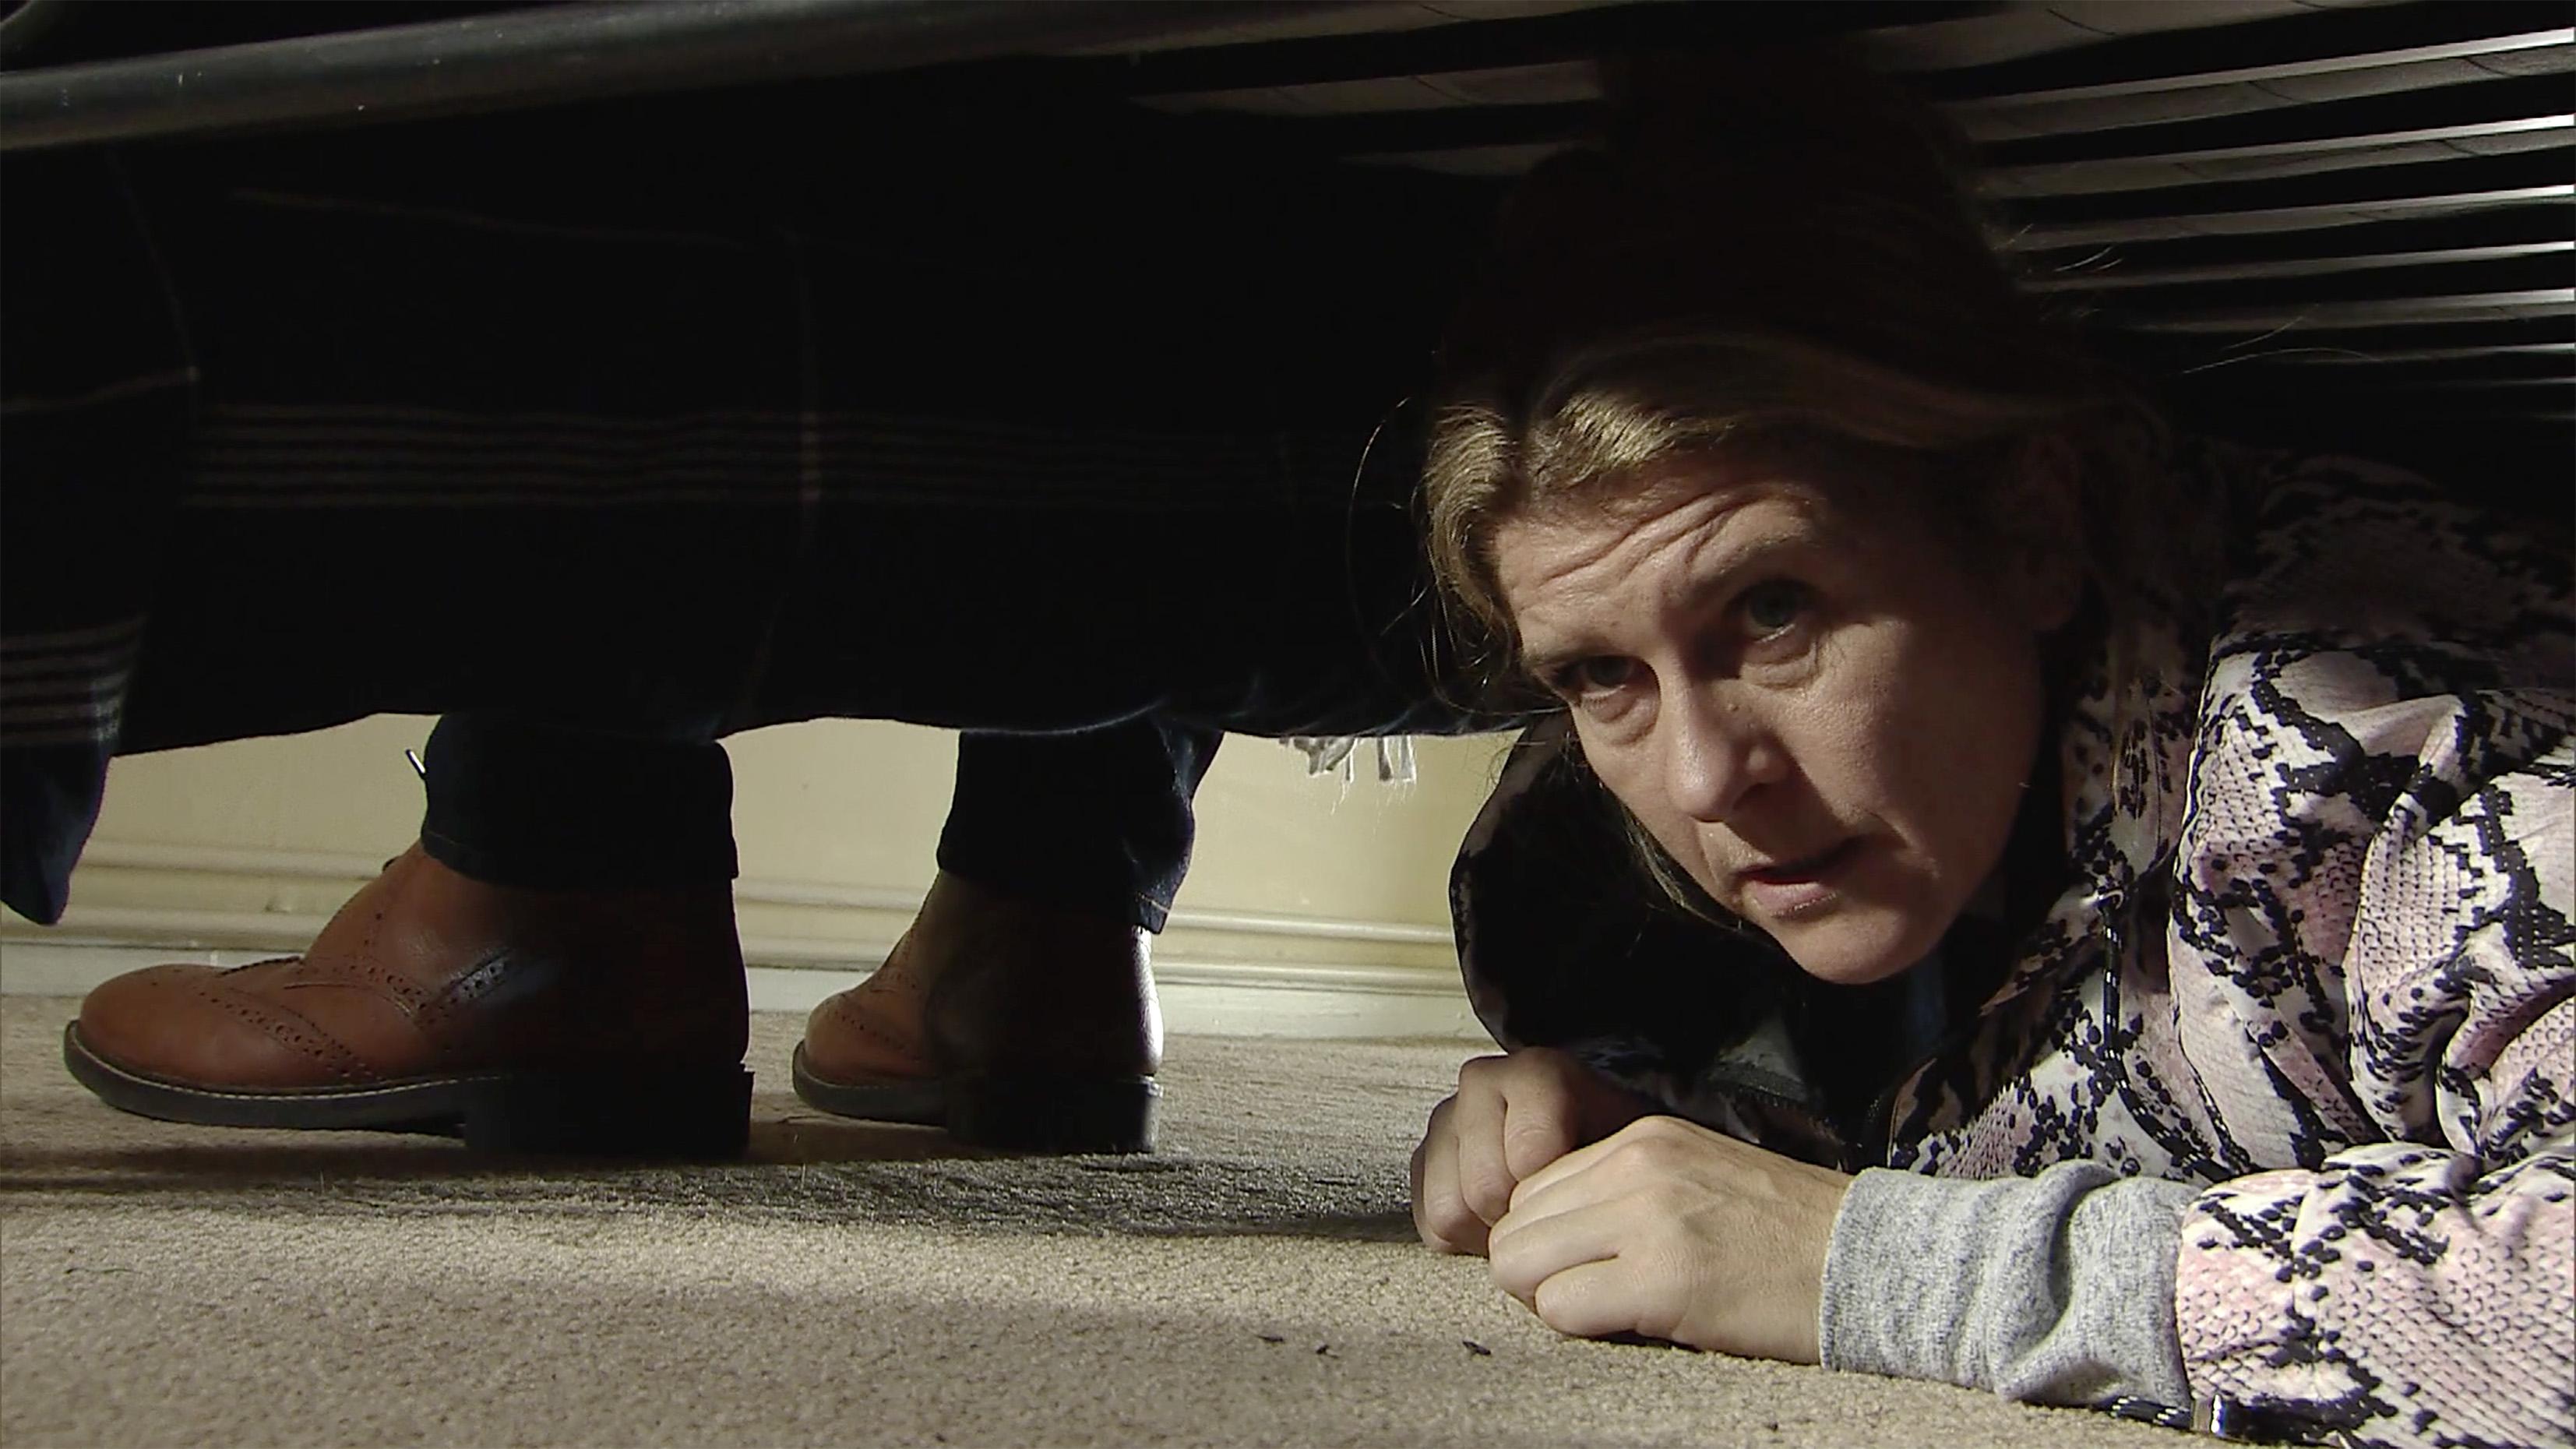 Coronation Street spoilers: Gina Seddon dies in shocking tragedy after Sally Metcalfe war?